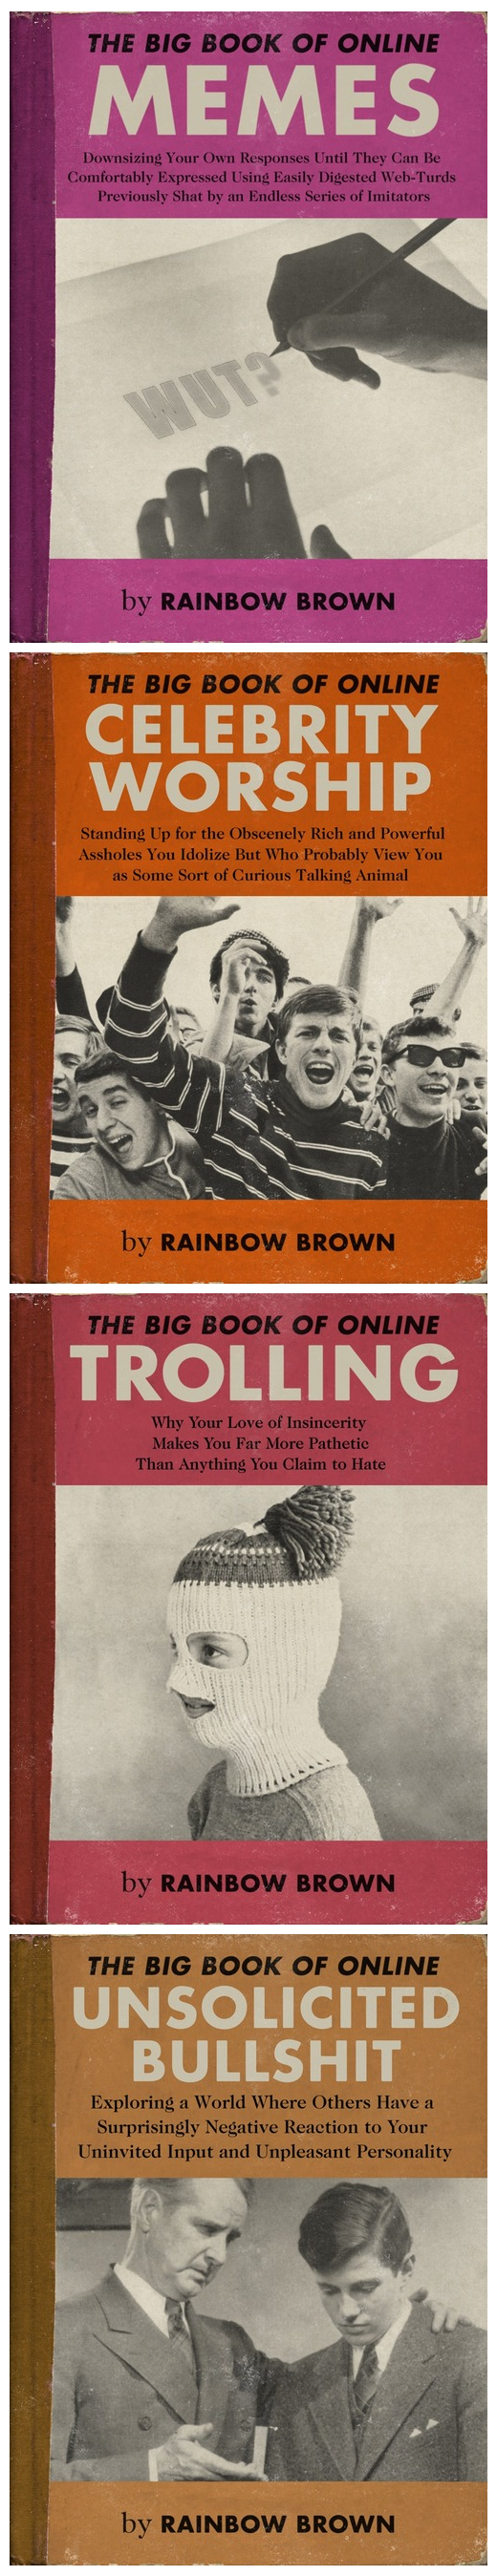 The big book. ekoms.. Rainbow Brown deserves a Pulitzer